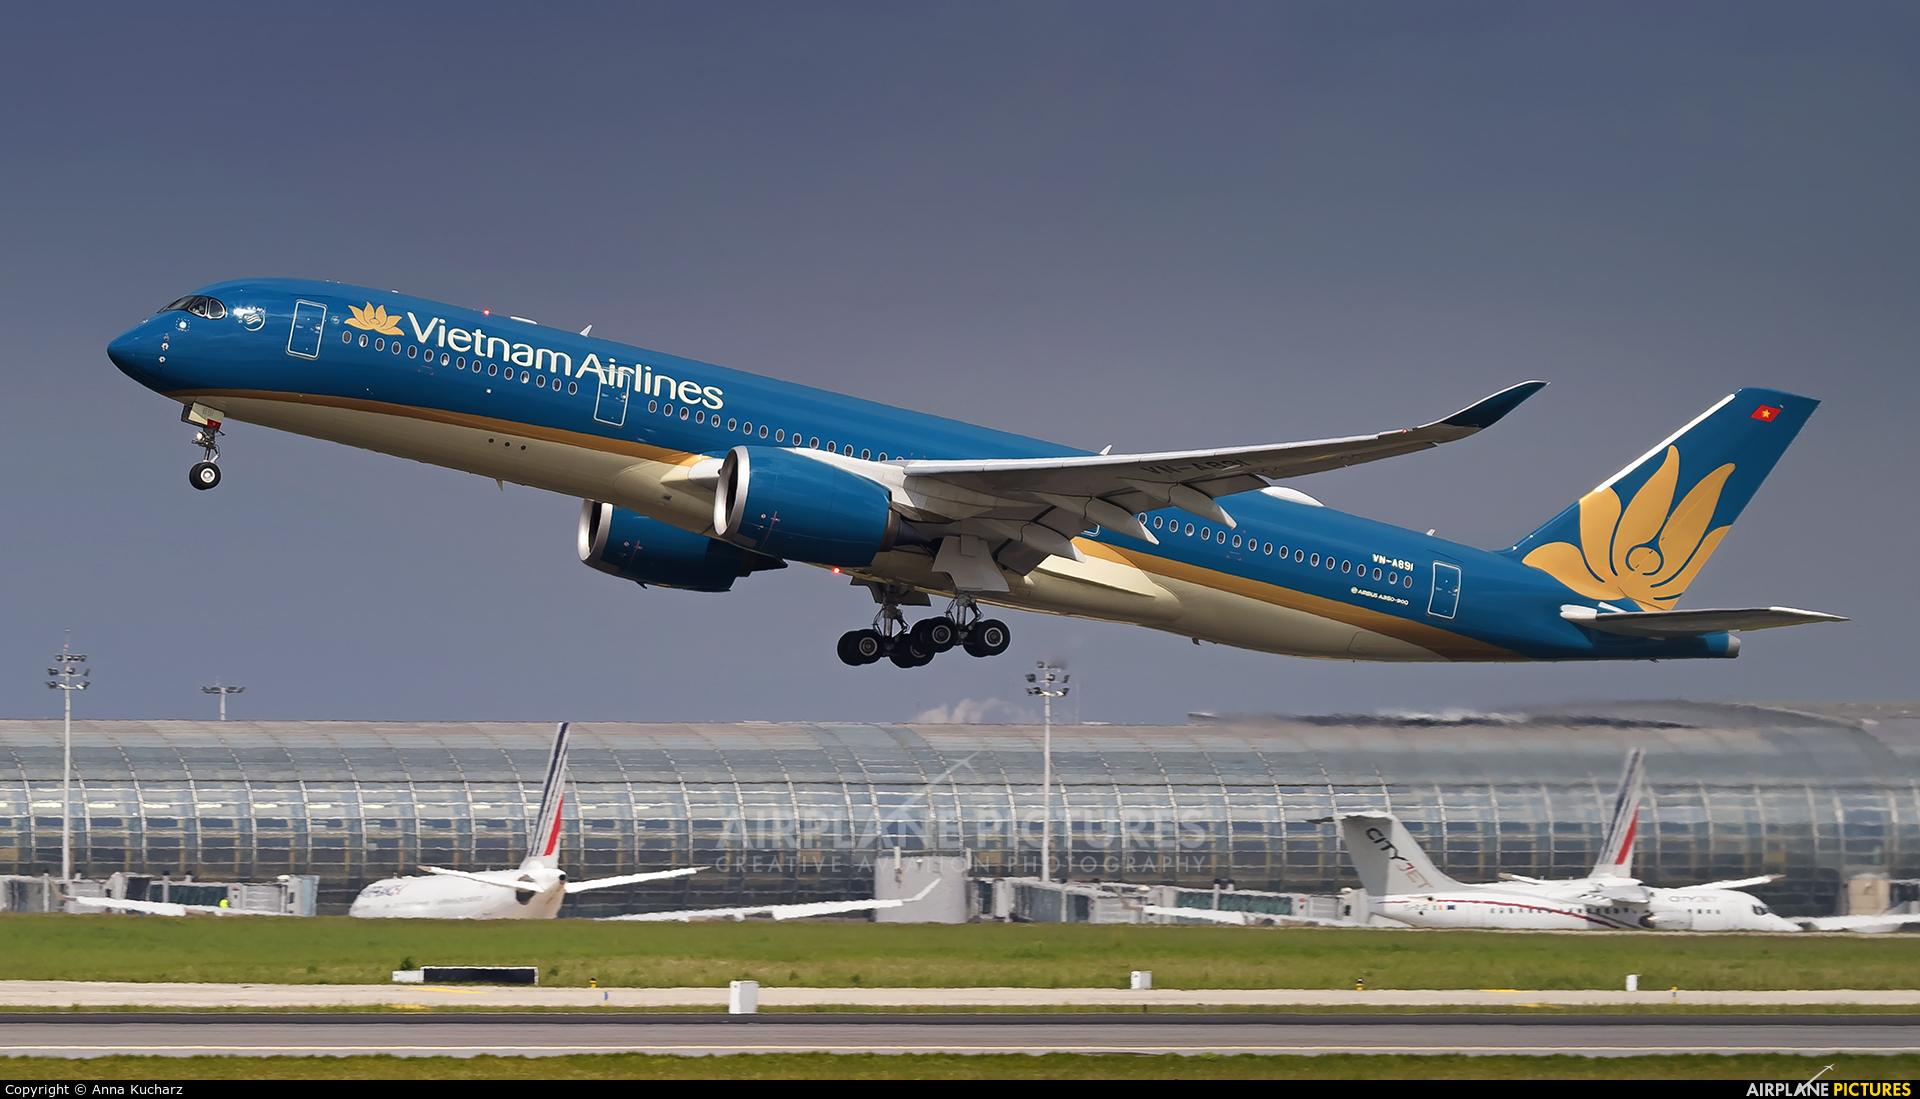 Vietnam Airlines VN-A891 aircraft at Paris - Charles de Gaulle